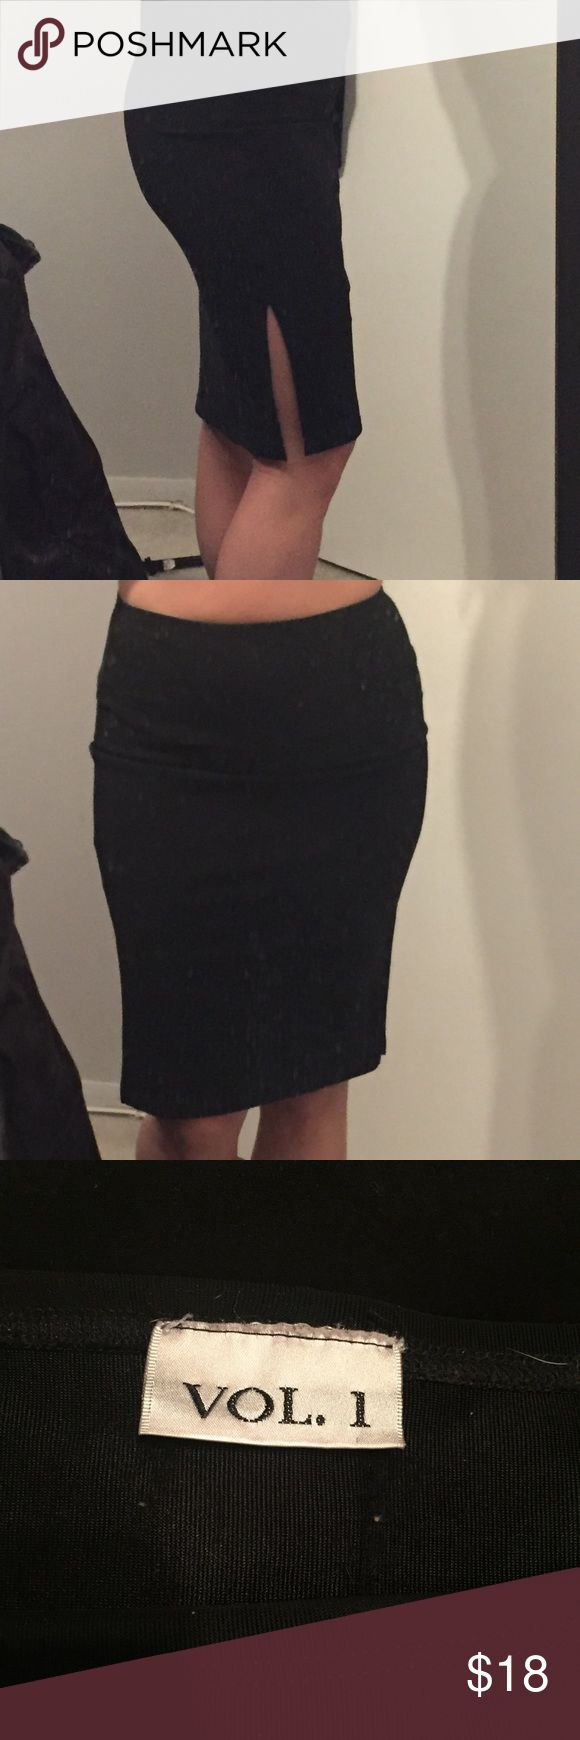 Pencil skirt with slits Elastic waist pencil skirt with slits on both sides Skirts Pencil